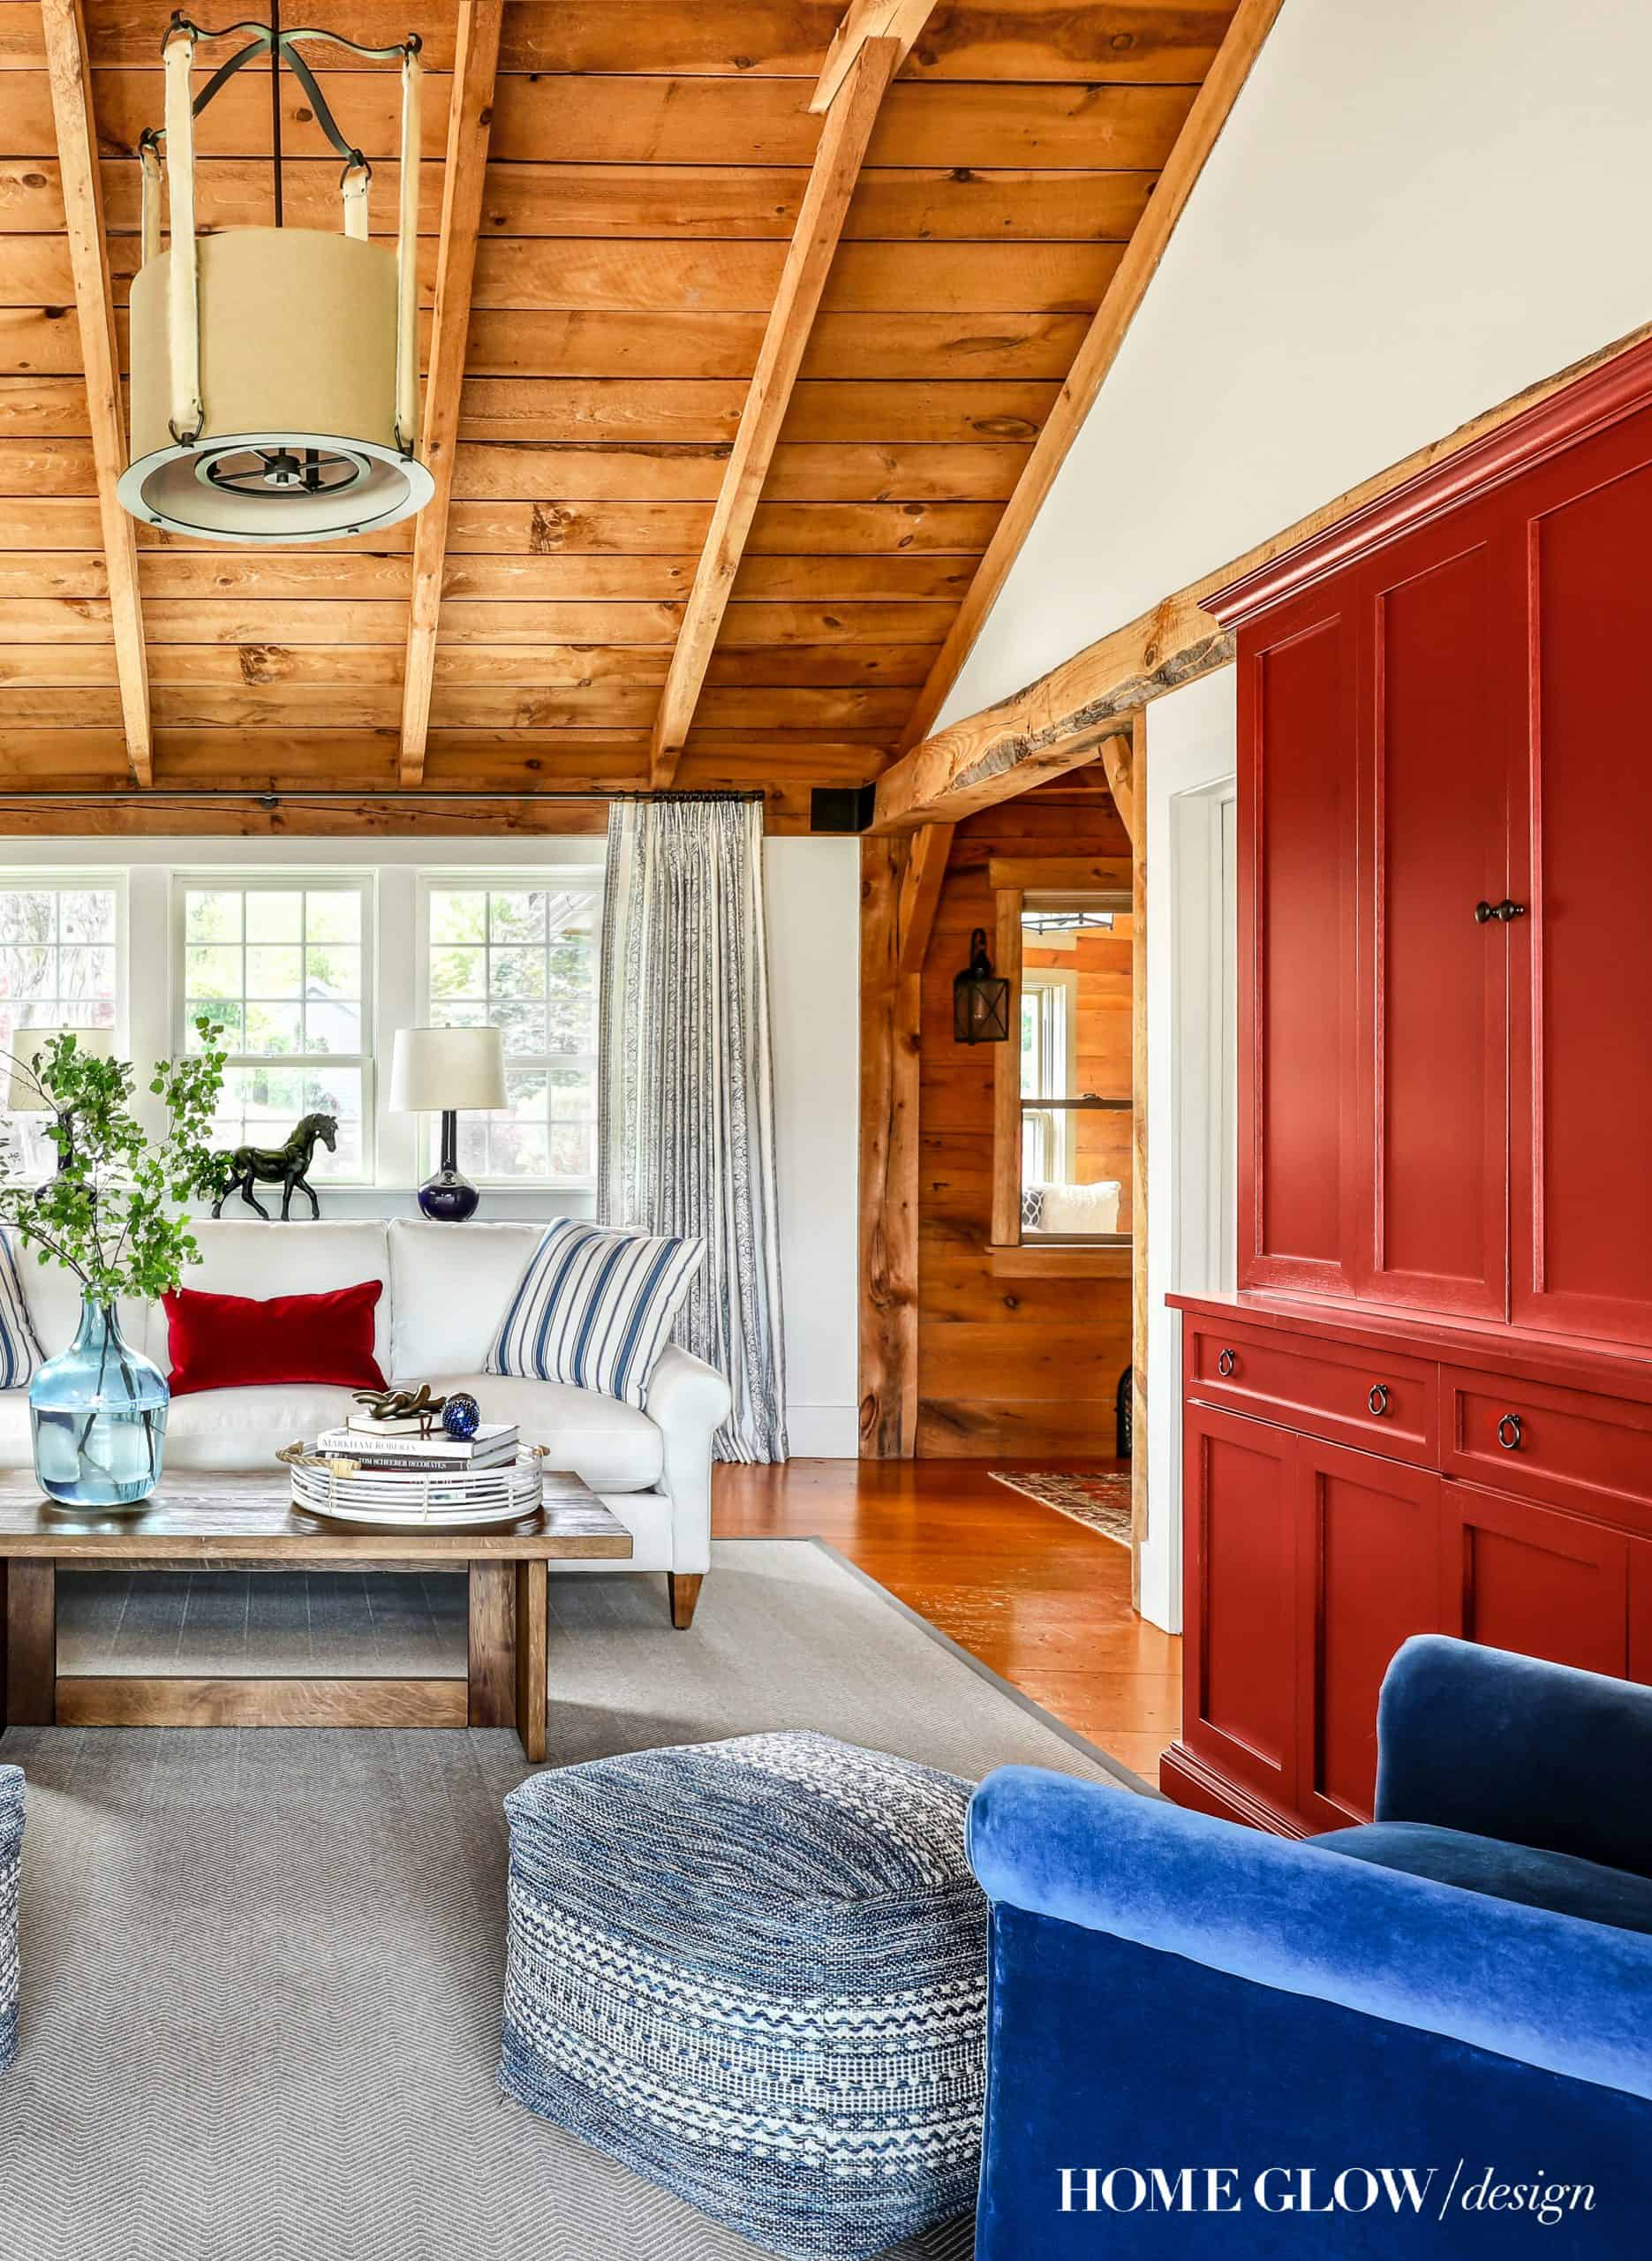 Home Glow Design Modern Rustic Living Room